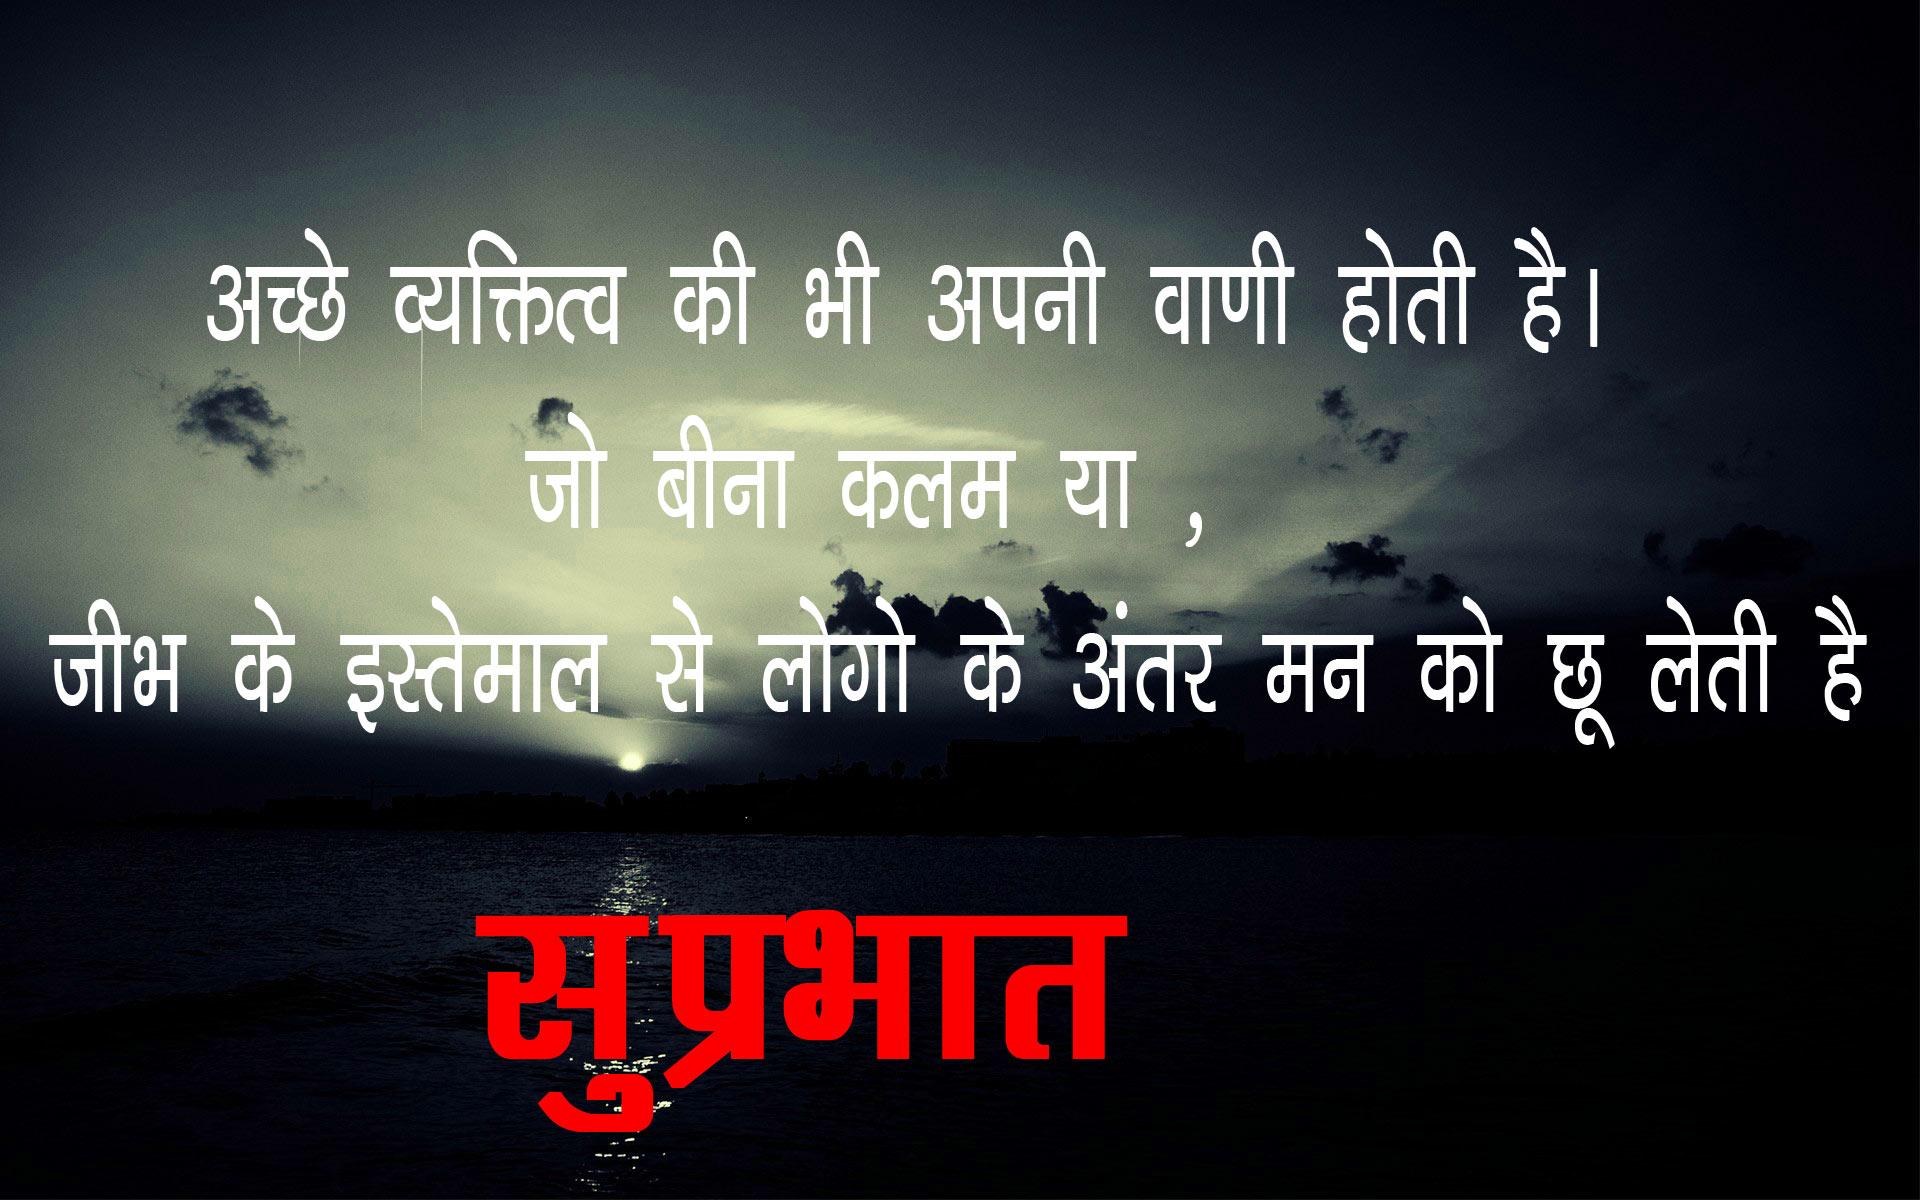 Good Morning Hindi Suvichar Images Pics Fre Download